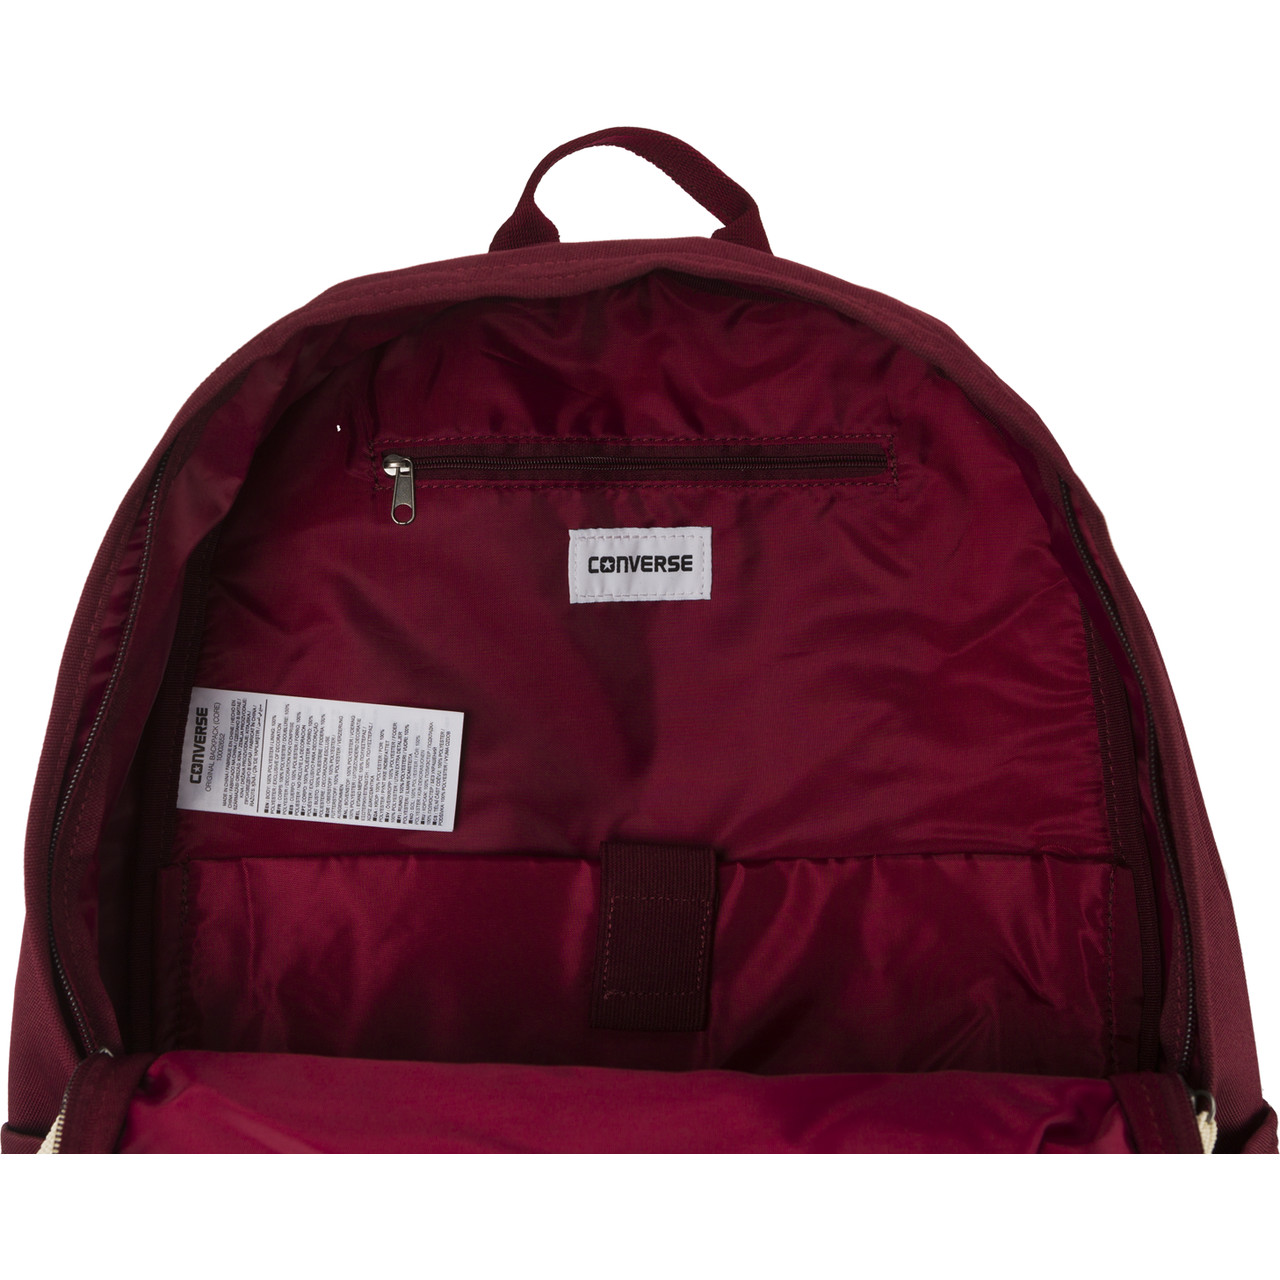 07e89de80f16 ... Plecak Converse  br   small ORIGINAL BACKPACK ...